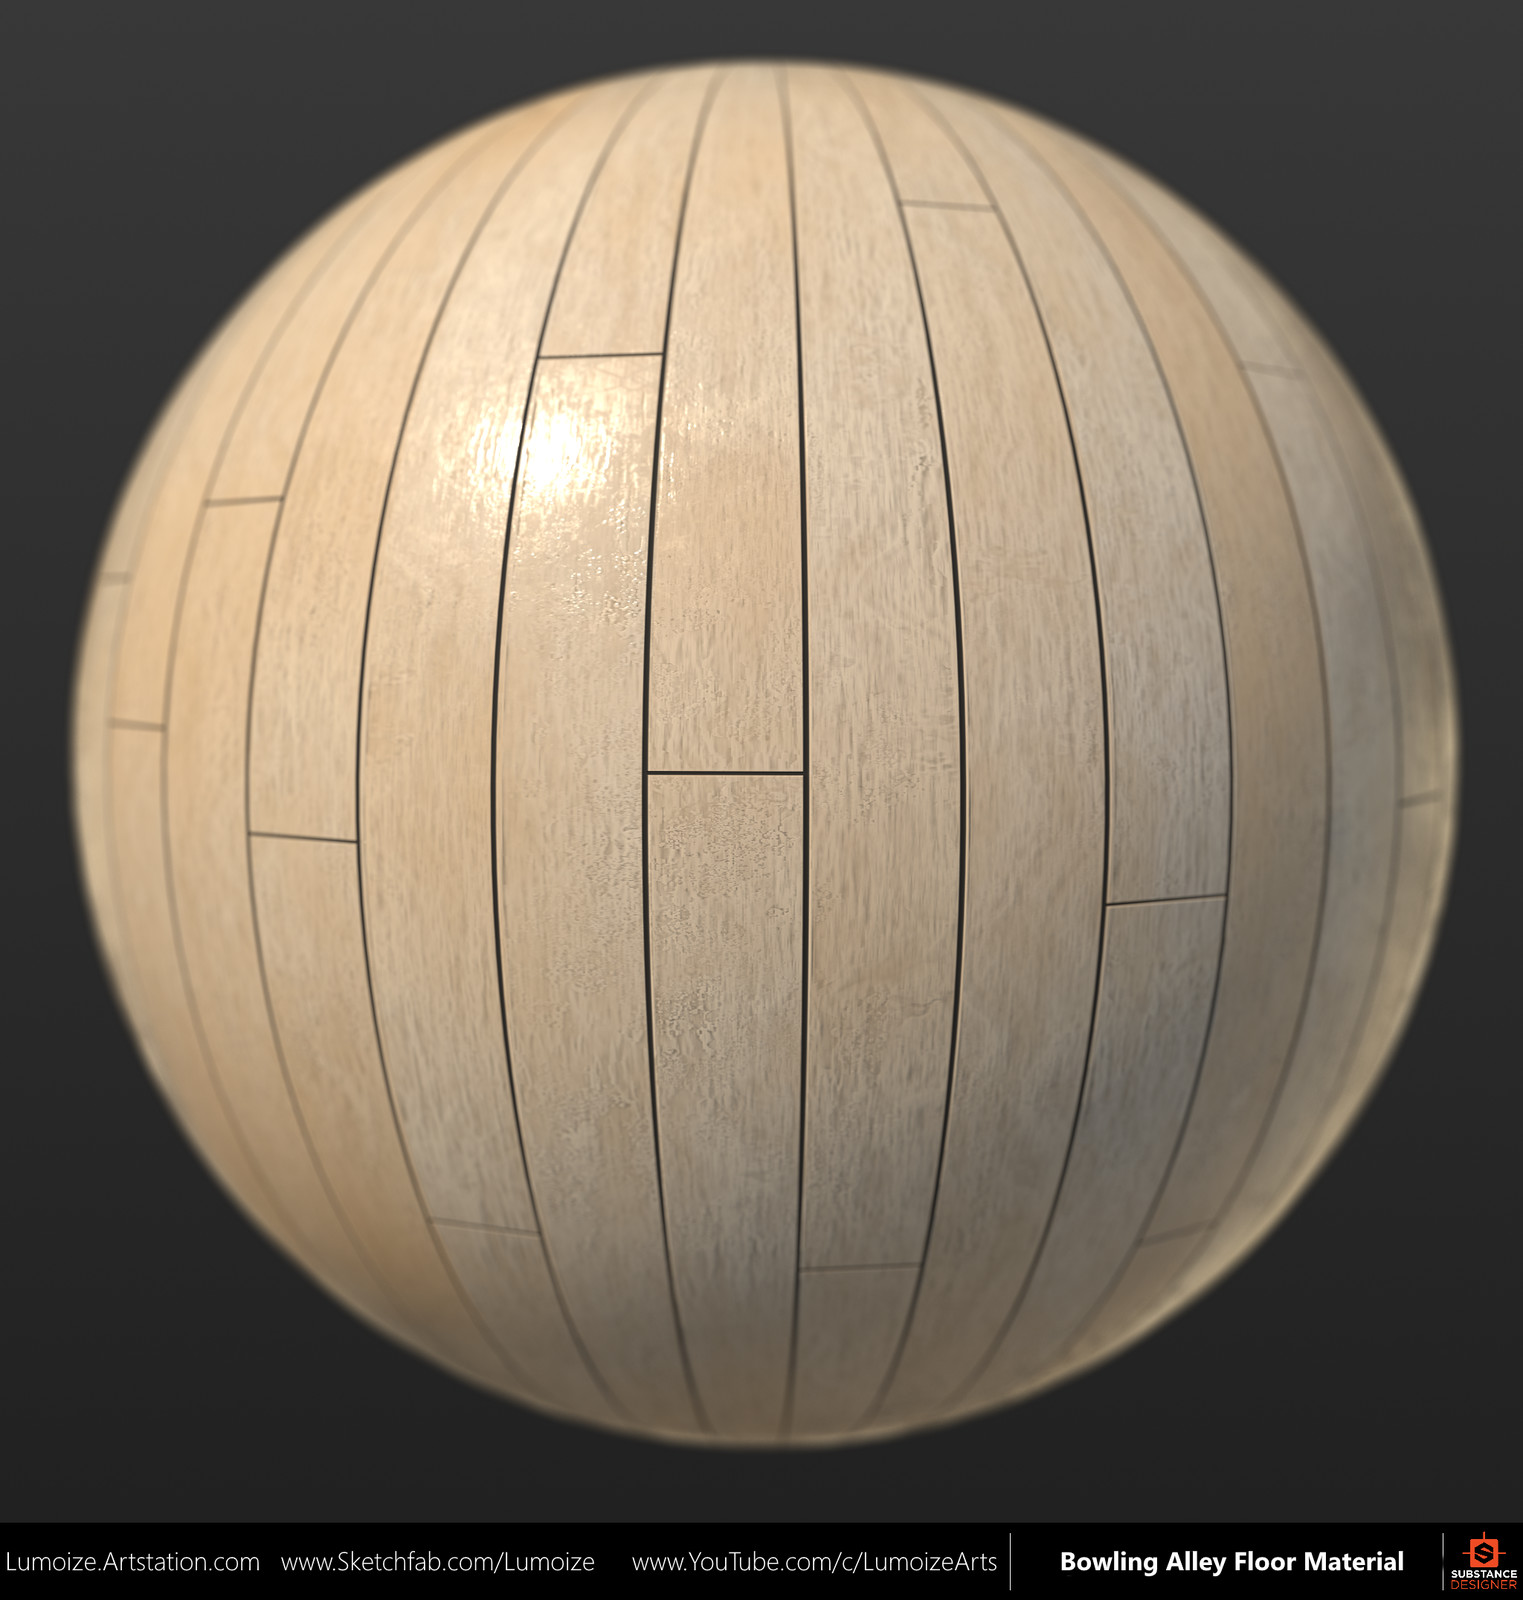 Bowling Alley Wood Floor